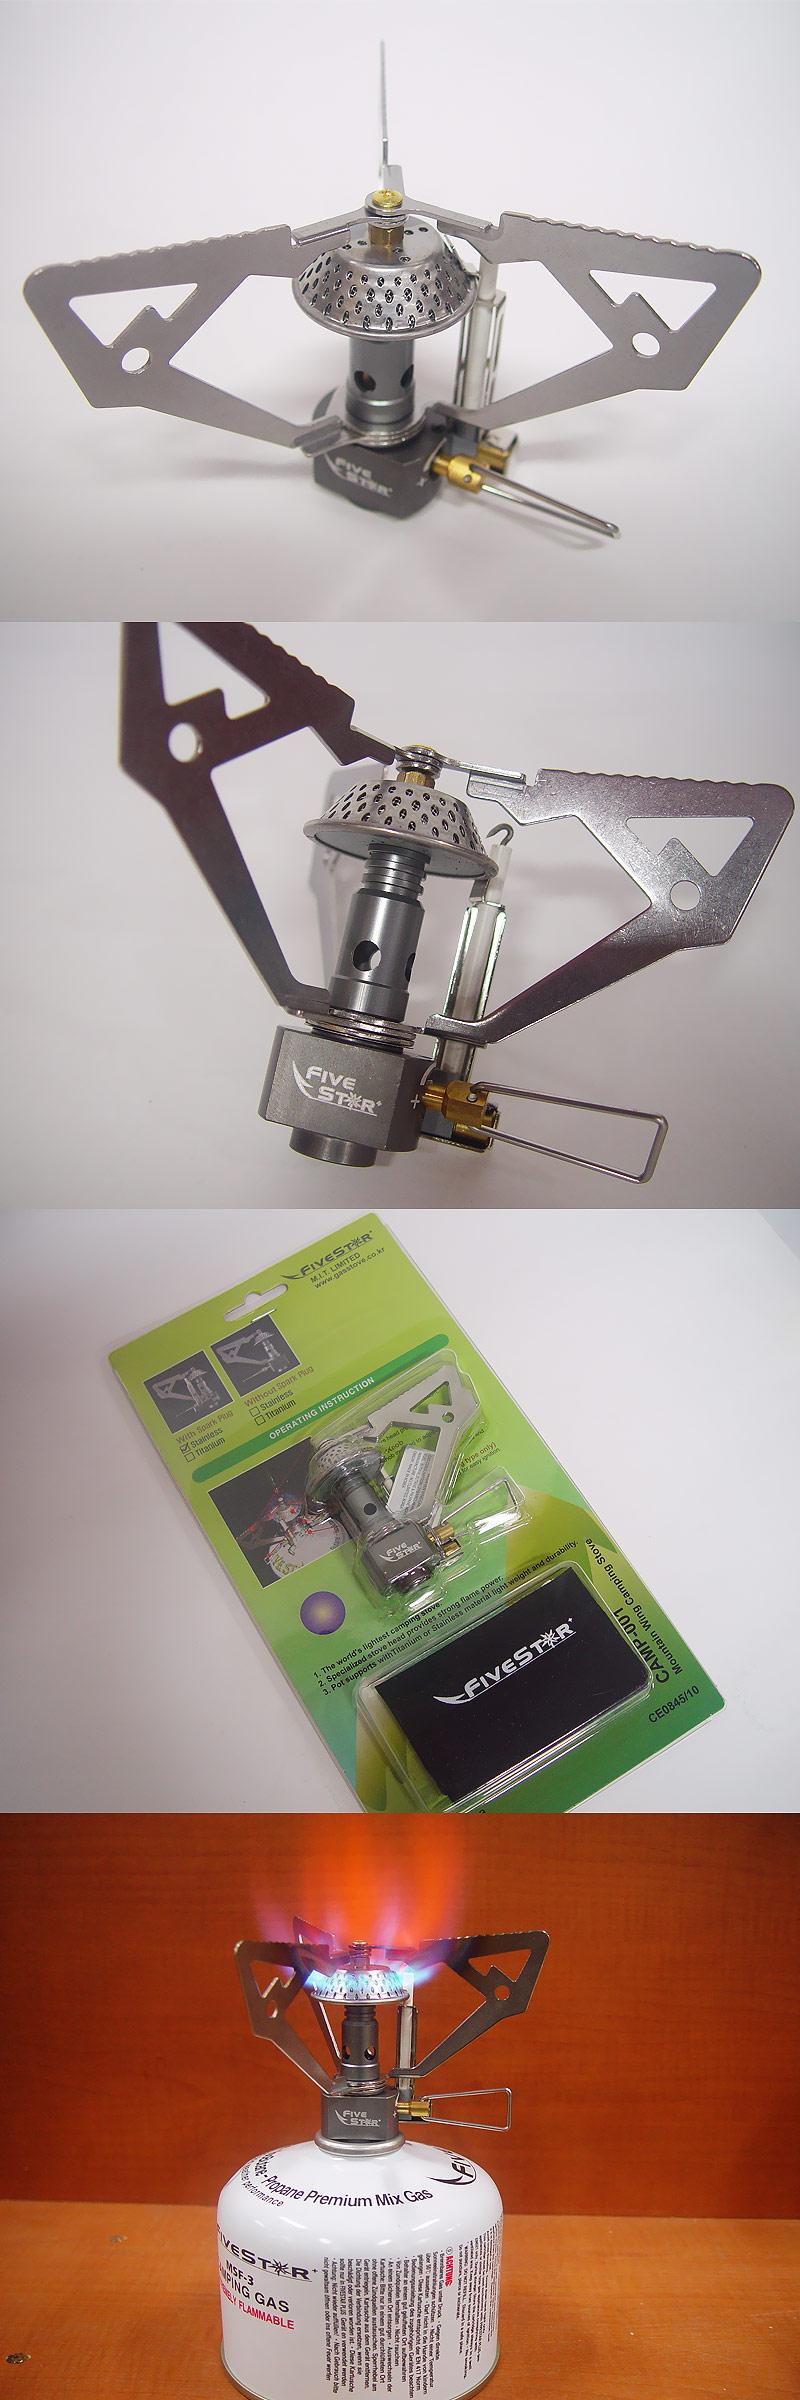 Backpack Stove & Lantern      Backpack Stove & Lantern